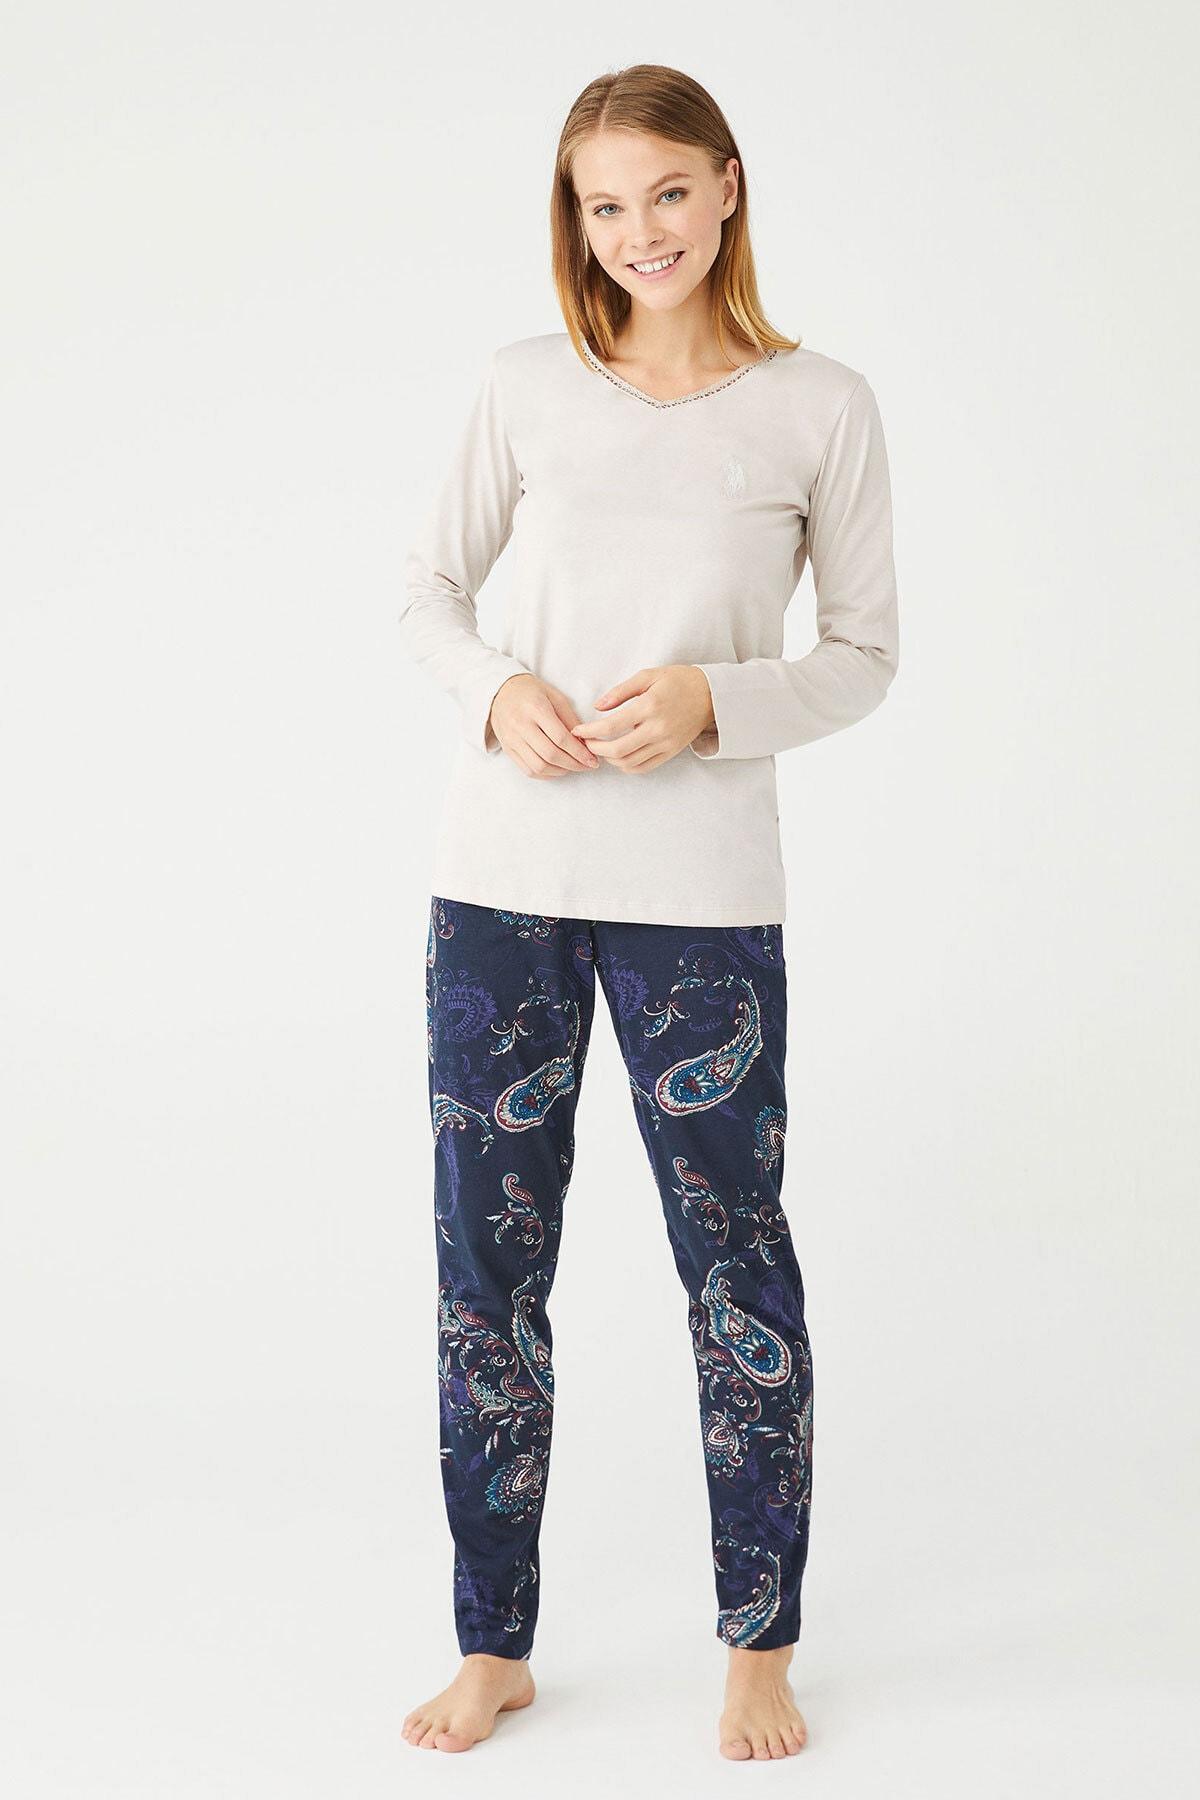 U.S POLO Kadın Bej Melanj V Yaka Pijama Takım 1